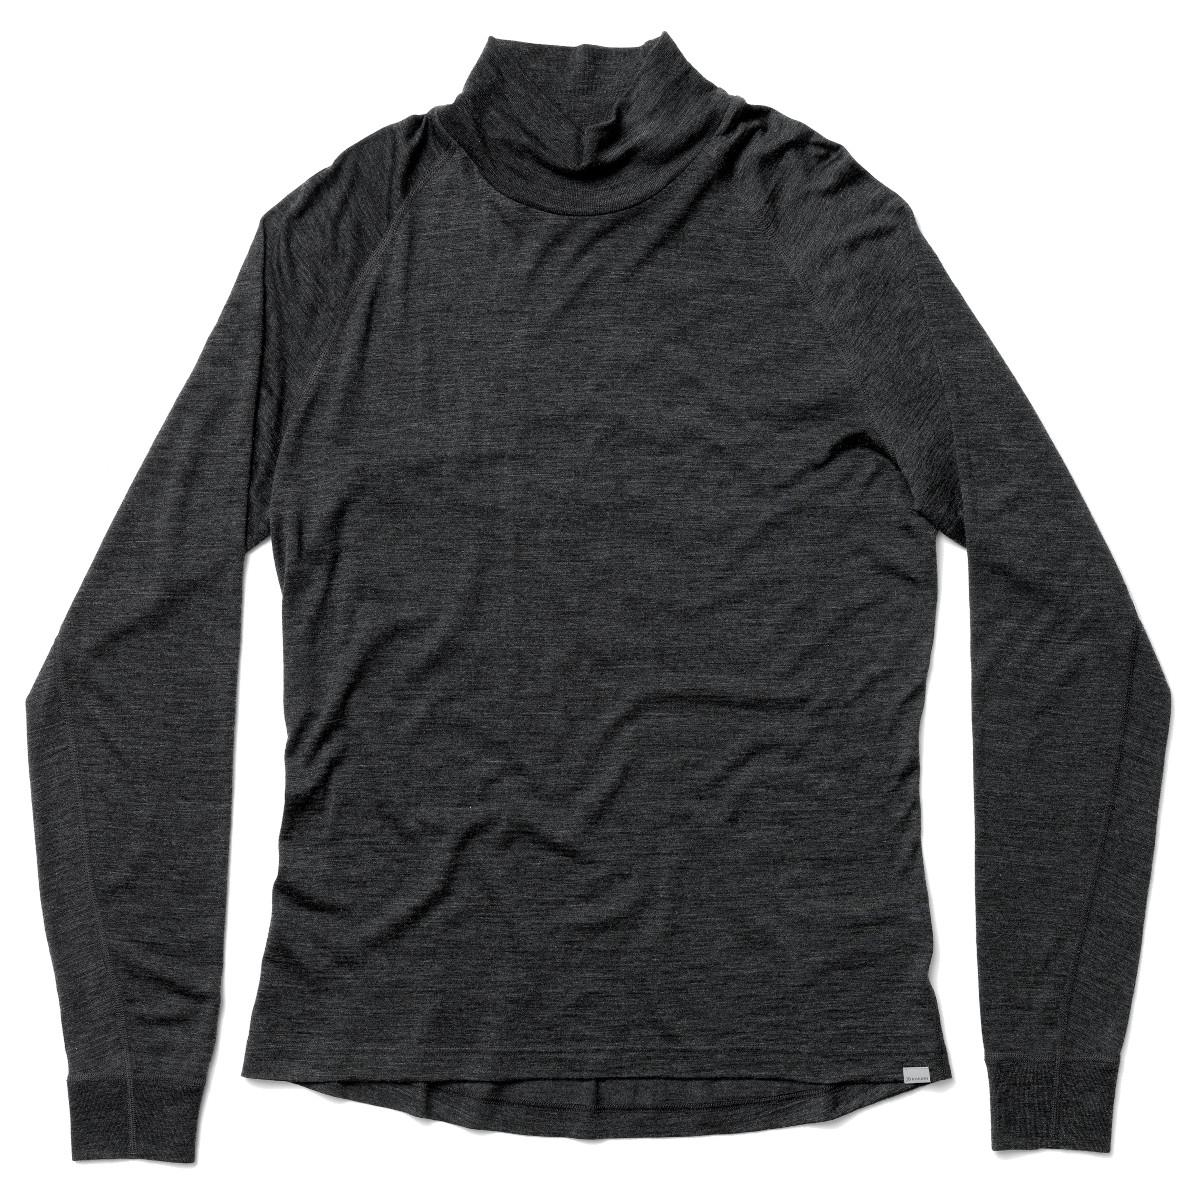 Houdini Men's Activist Turtleneck Long-Sleeve Shirt - True Black